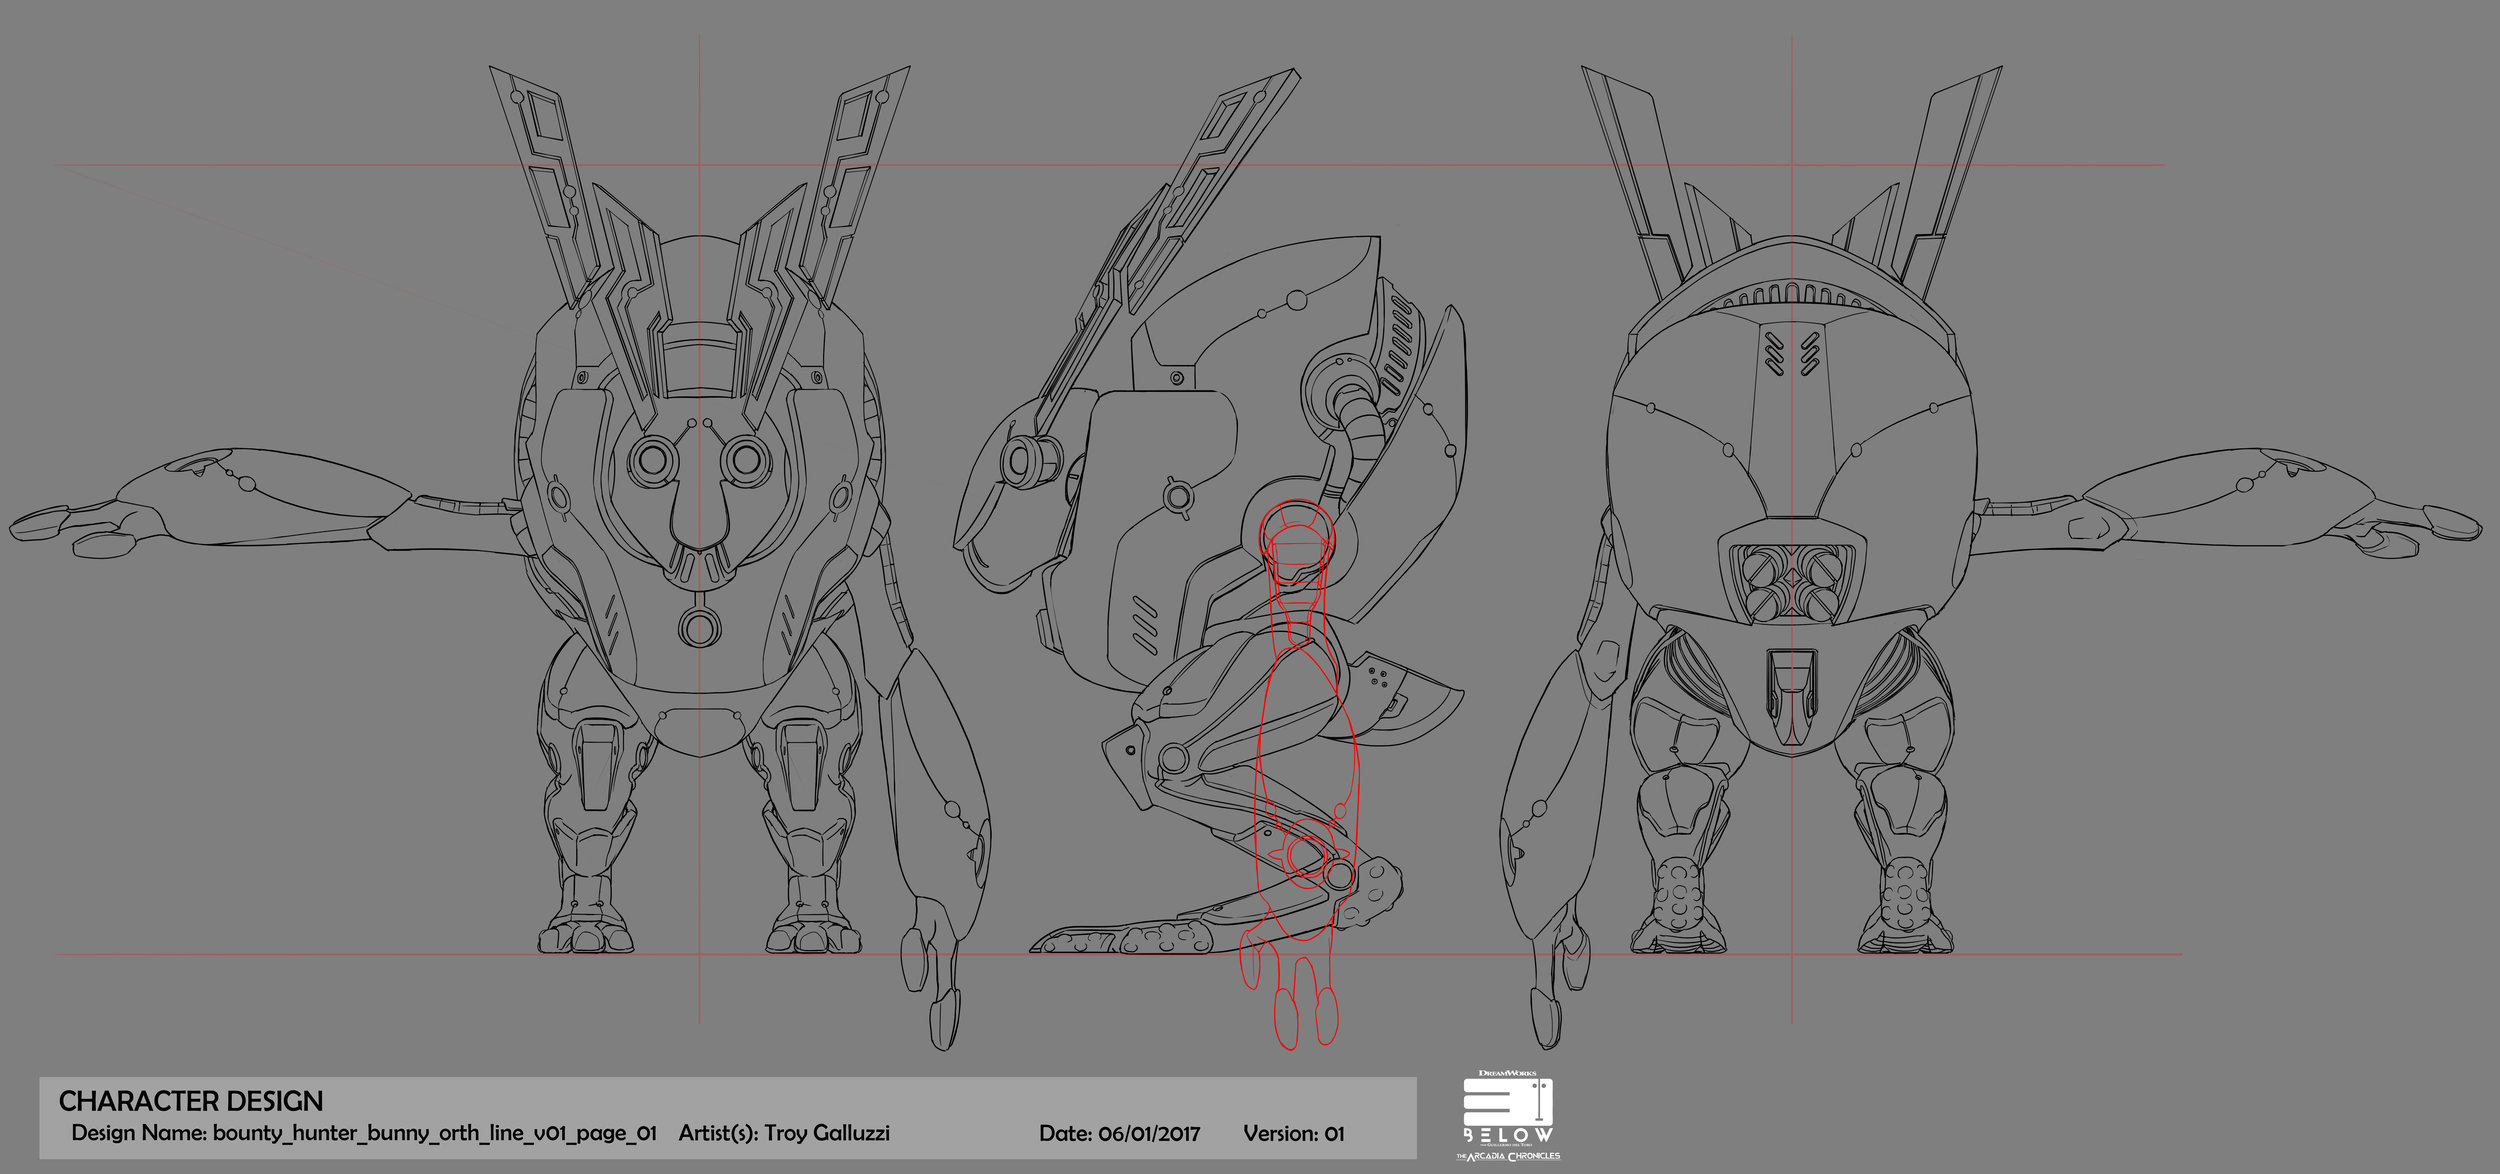 bounty_hunter_bunny_orth_line_v01_page_01.jpg